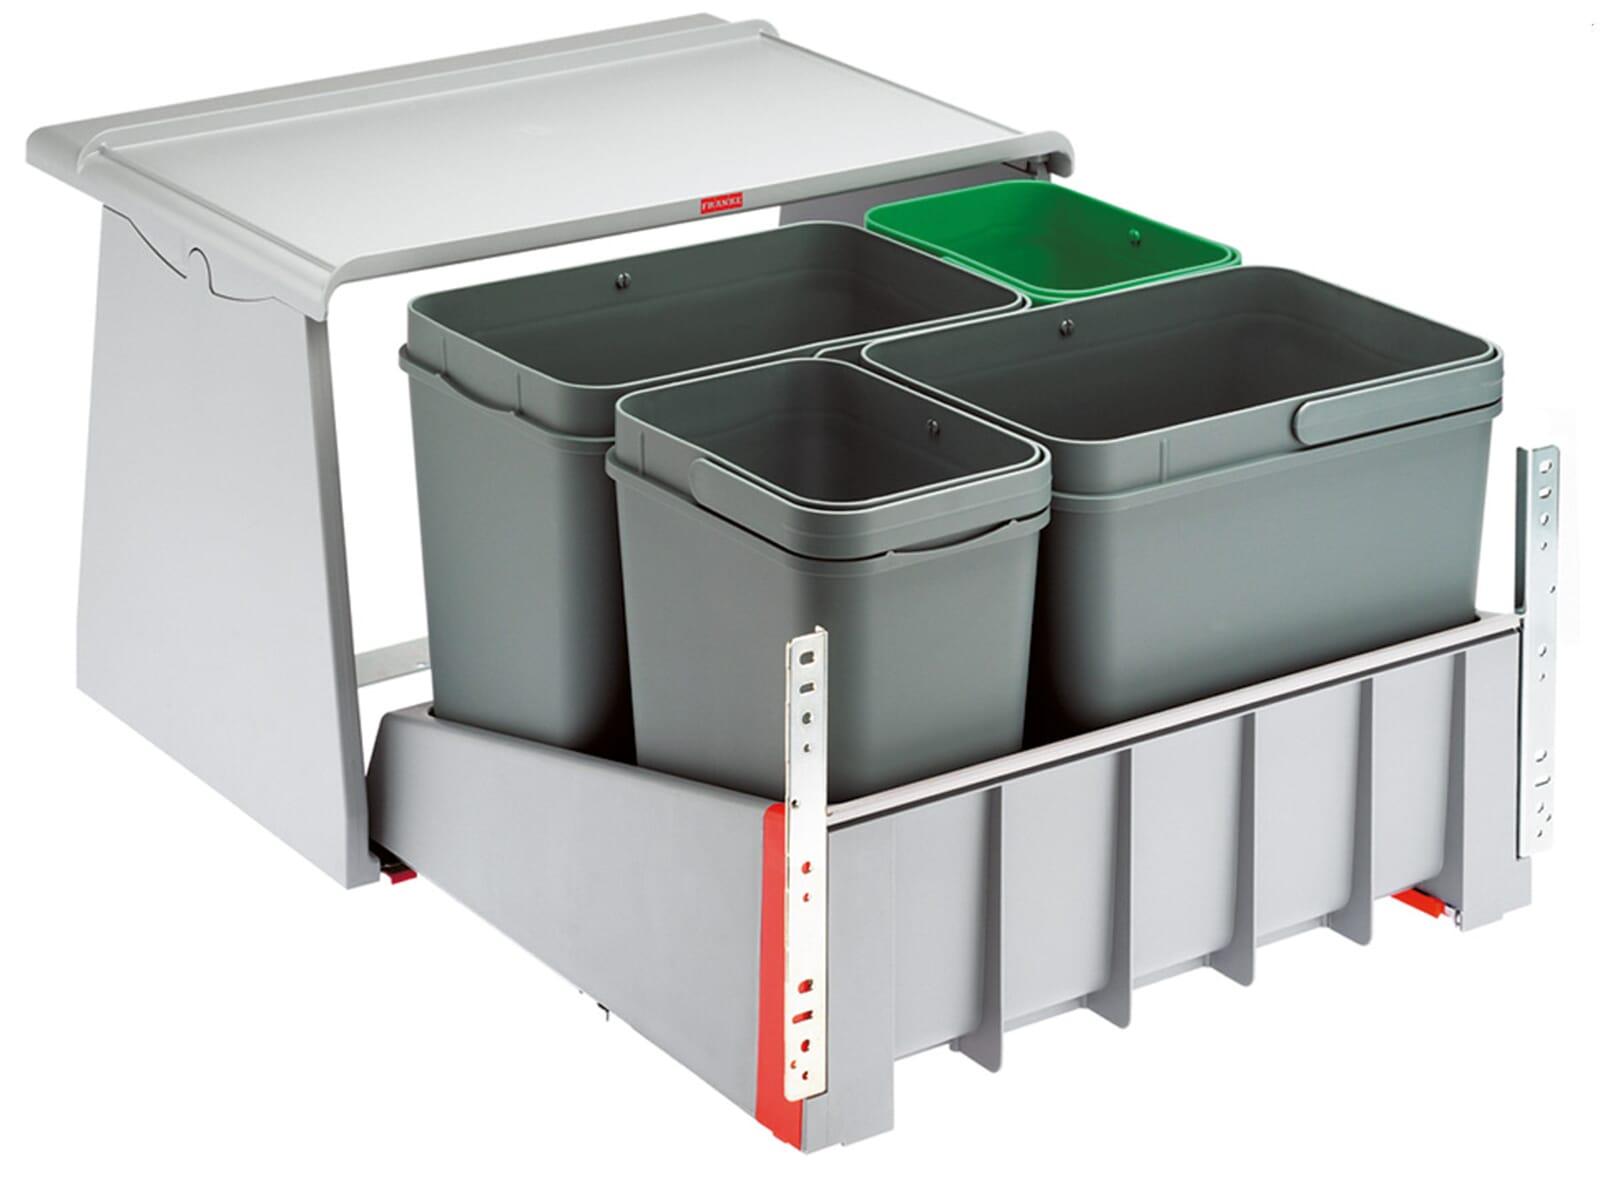 Produktabbildung Franke Sorter 700-60 Motion - 121.0173.363 Einbau Abfallsammler